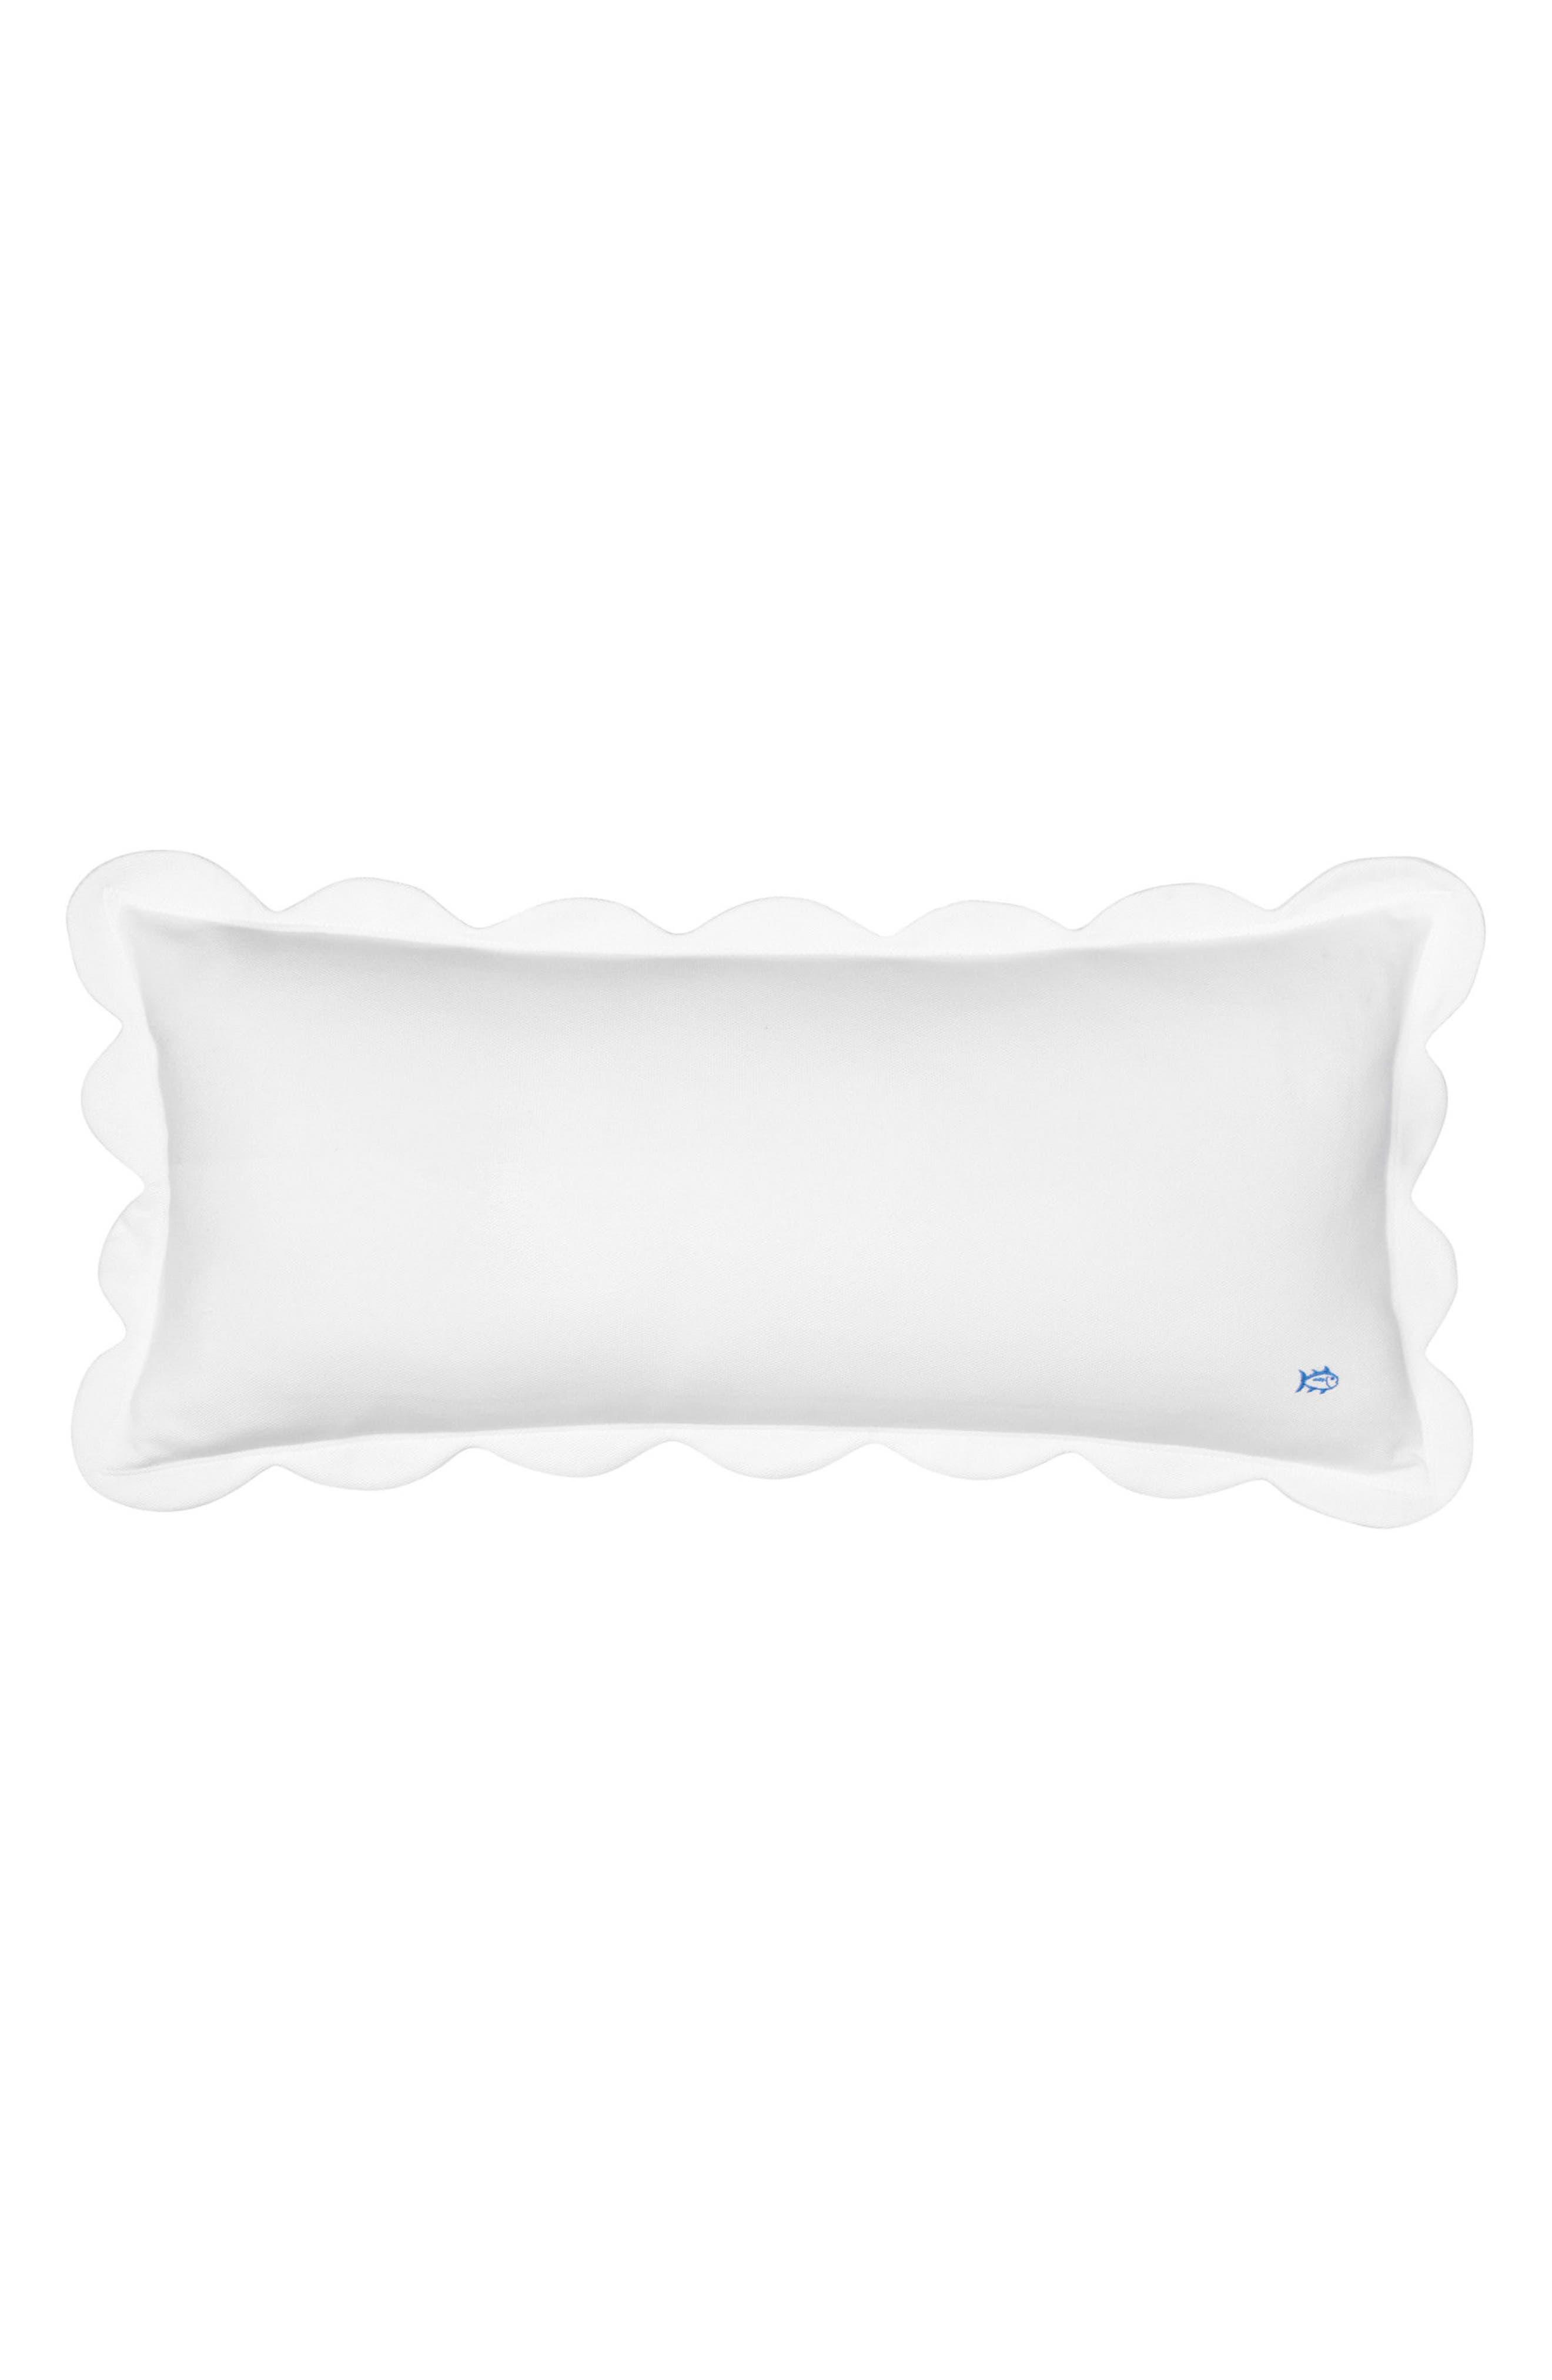 Sailgate Scalloped Accent Pillow,                             Main thumbnail 1, color,                             100